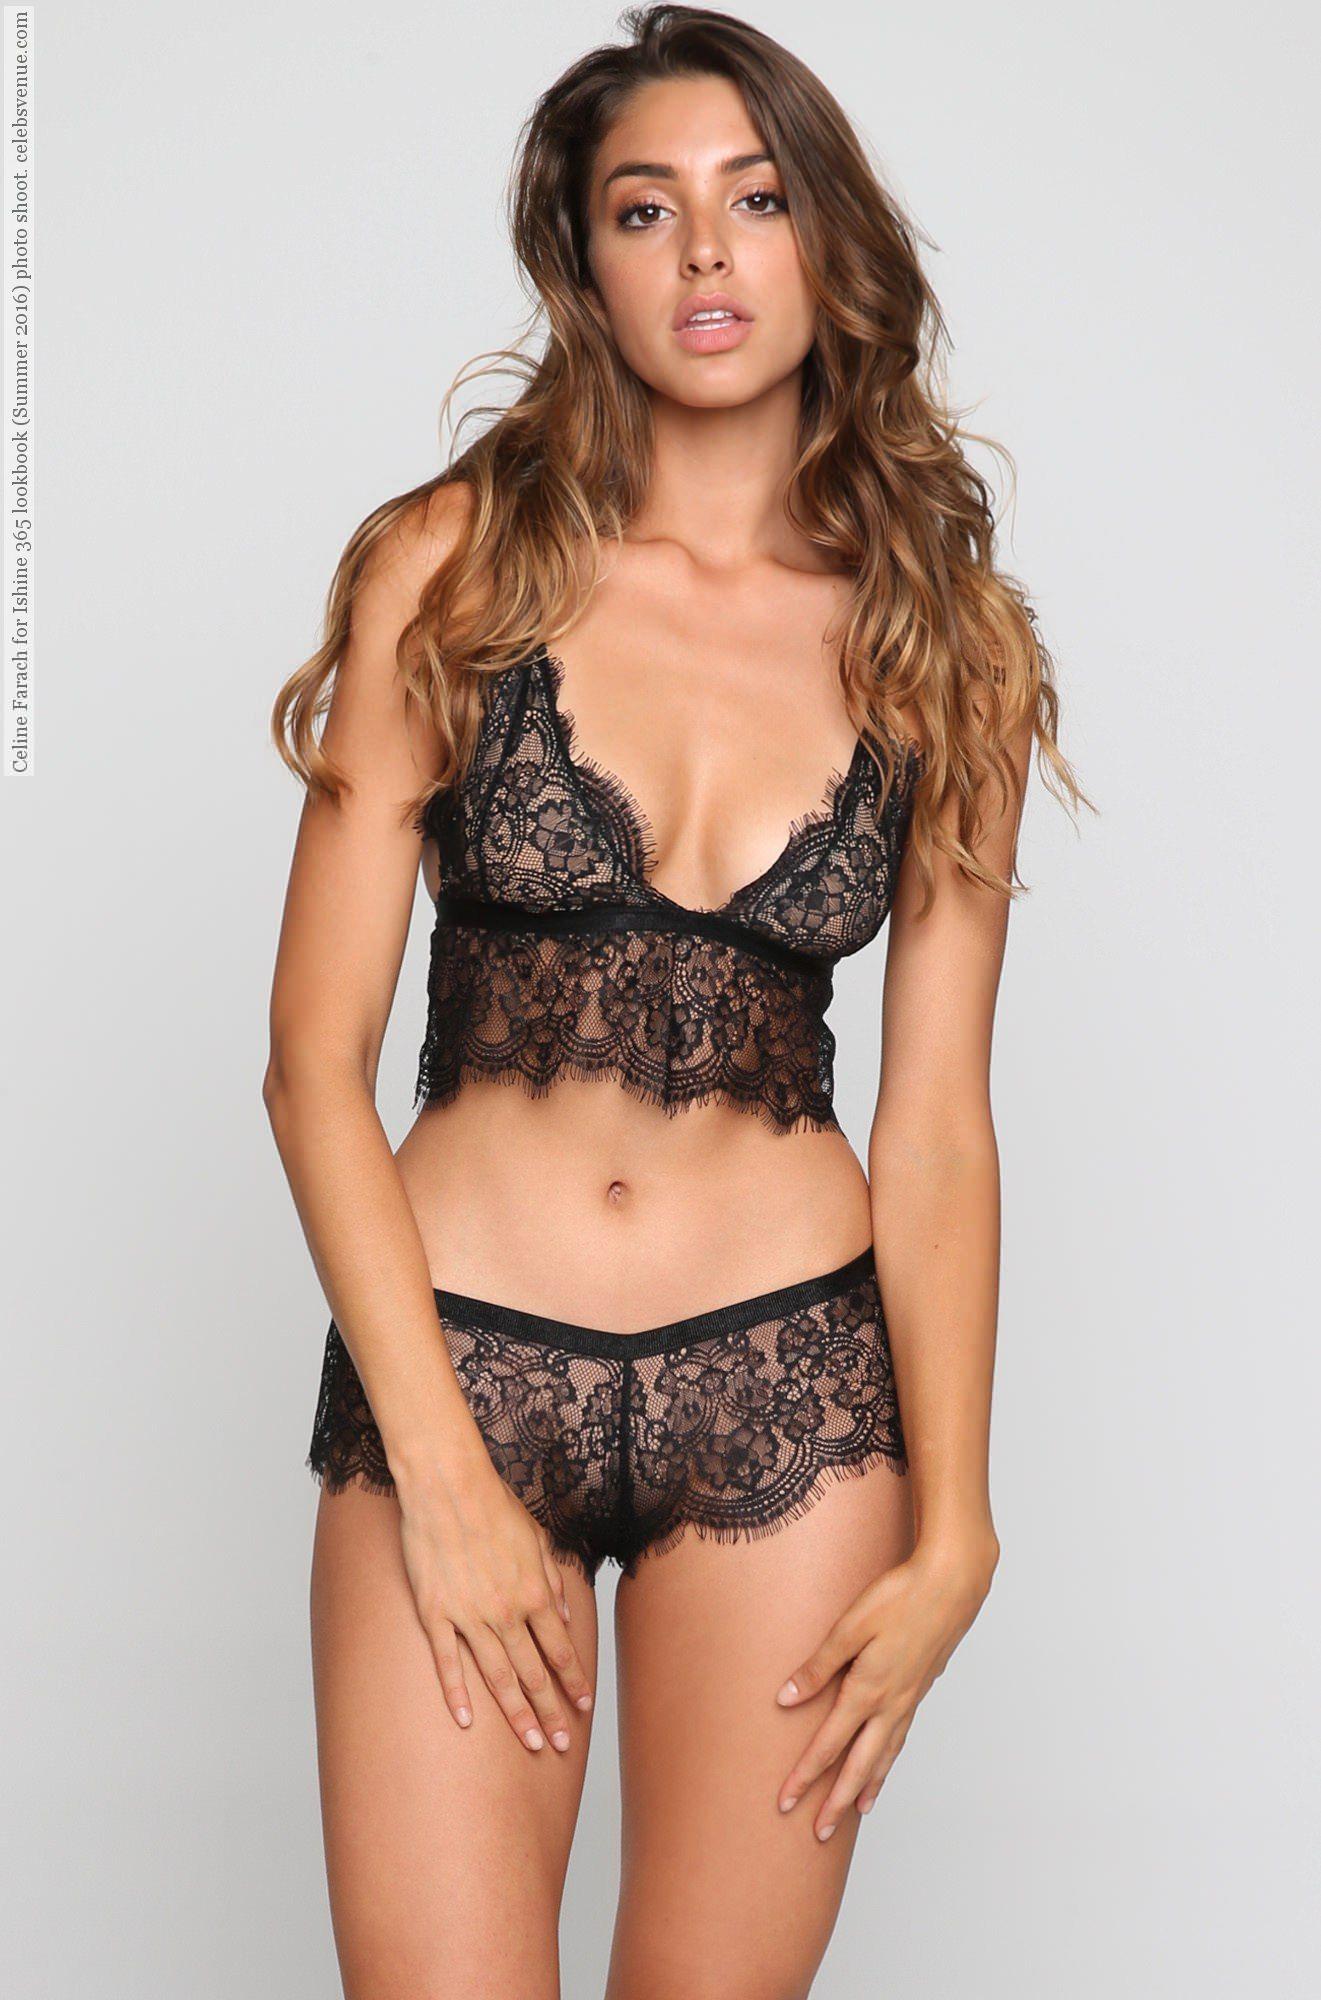 Celine Farach-hot-girl-dep-nhat-mang-xa-hoi-den-viet-nam.jpg5